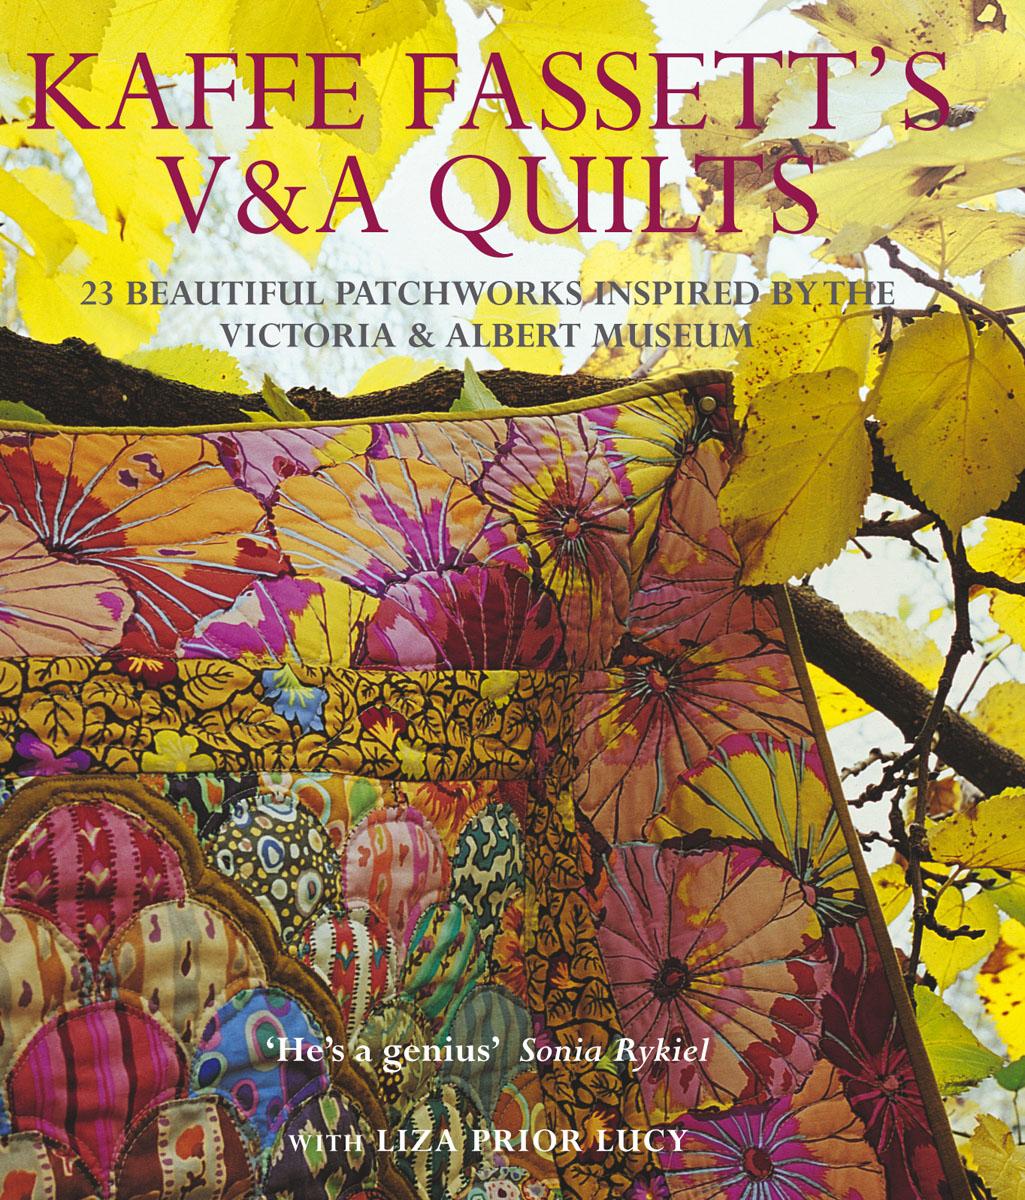 Kaffe Fassett's V & A Quilts